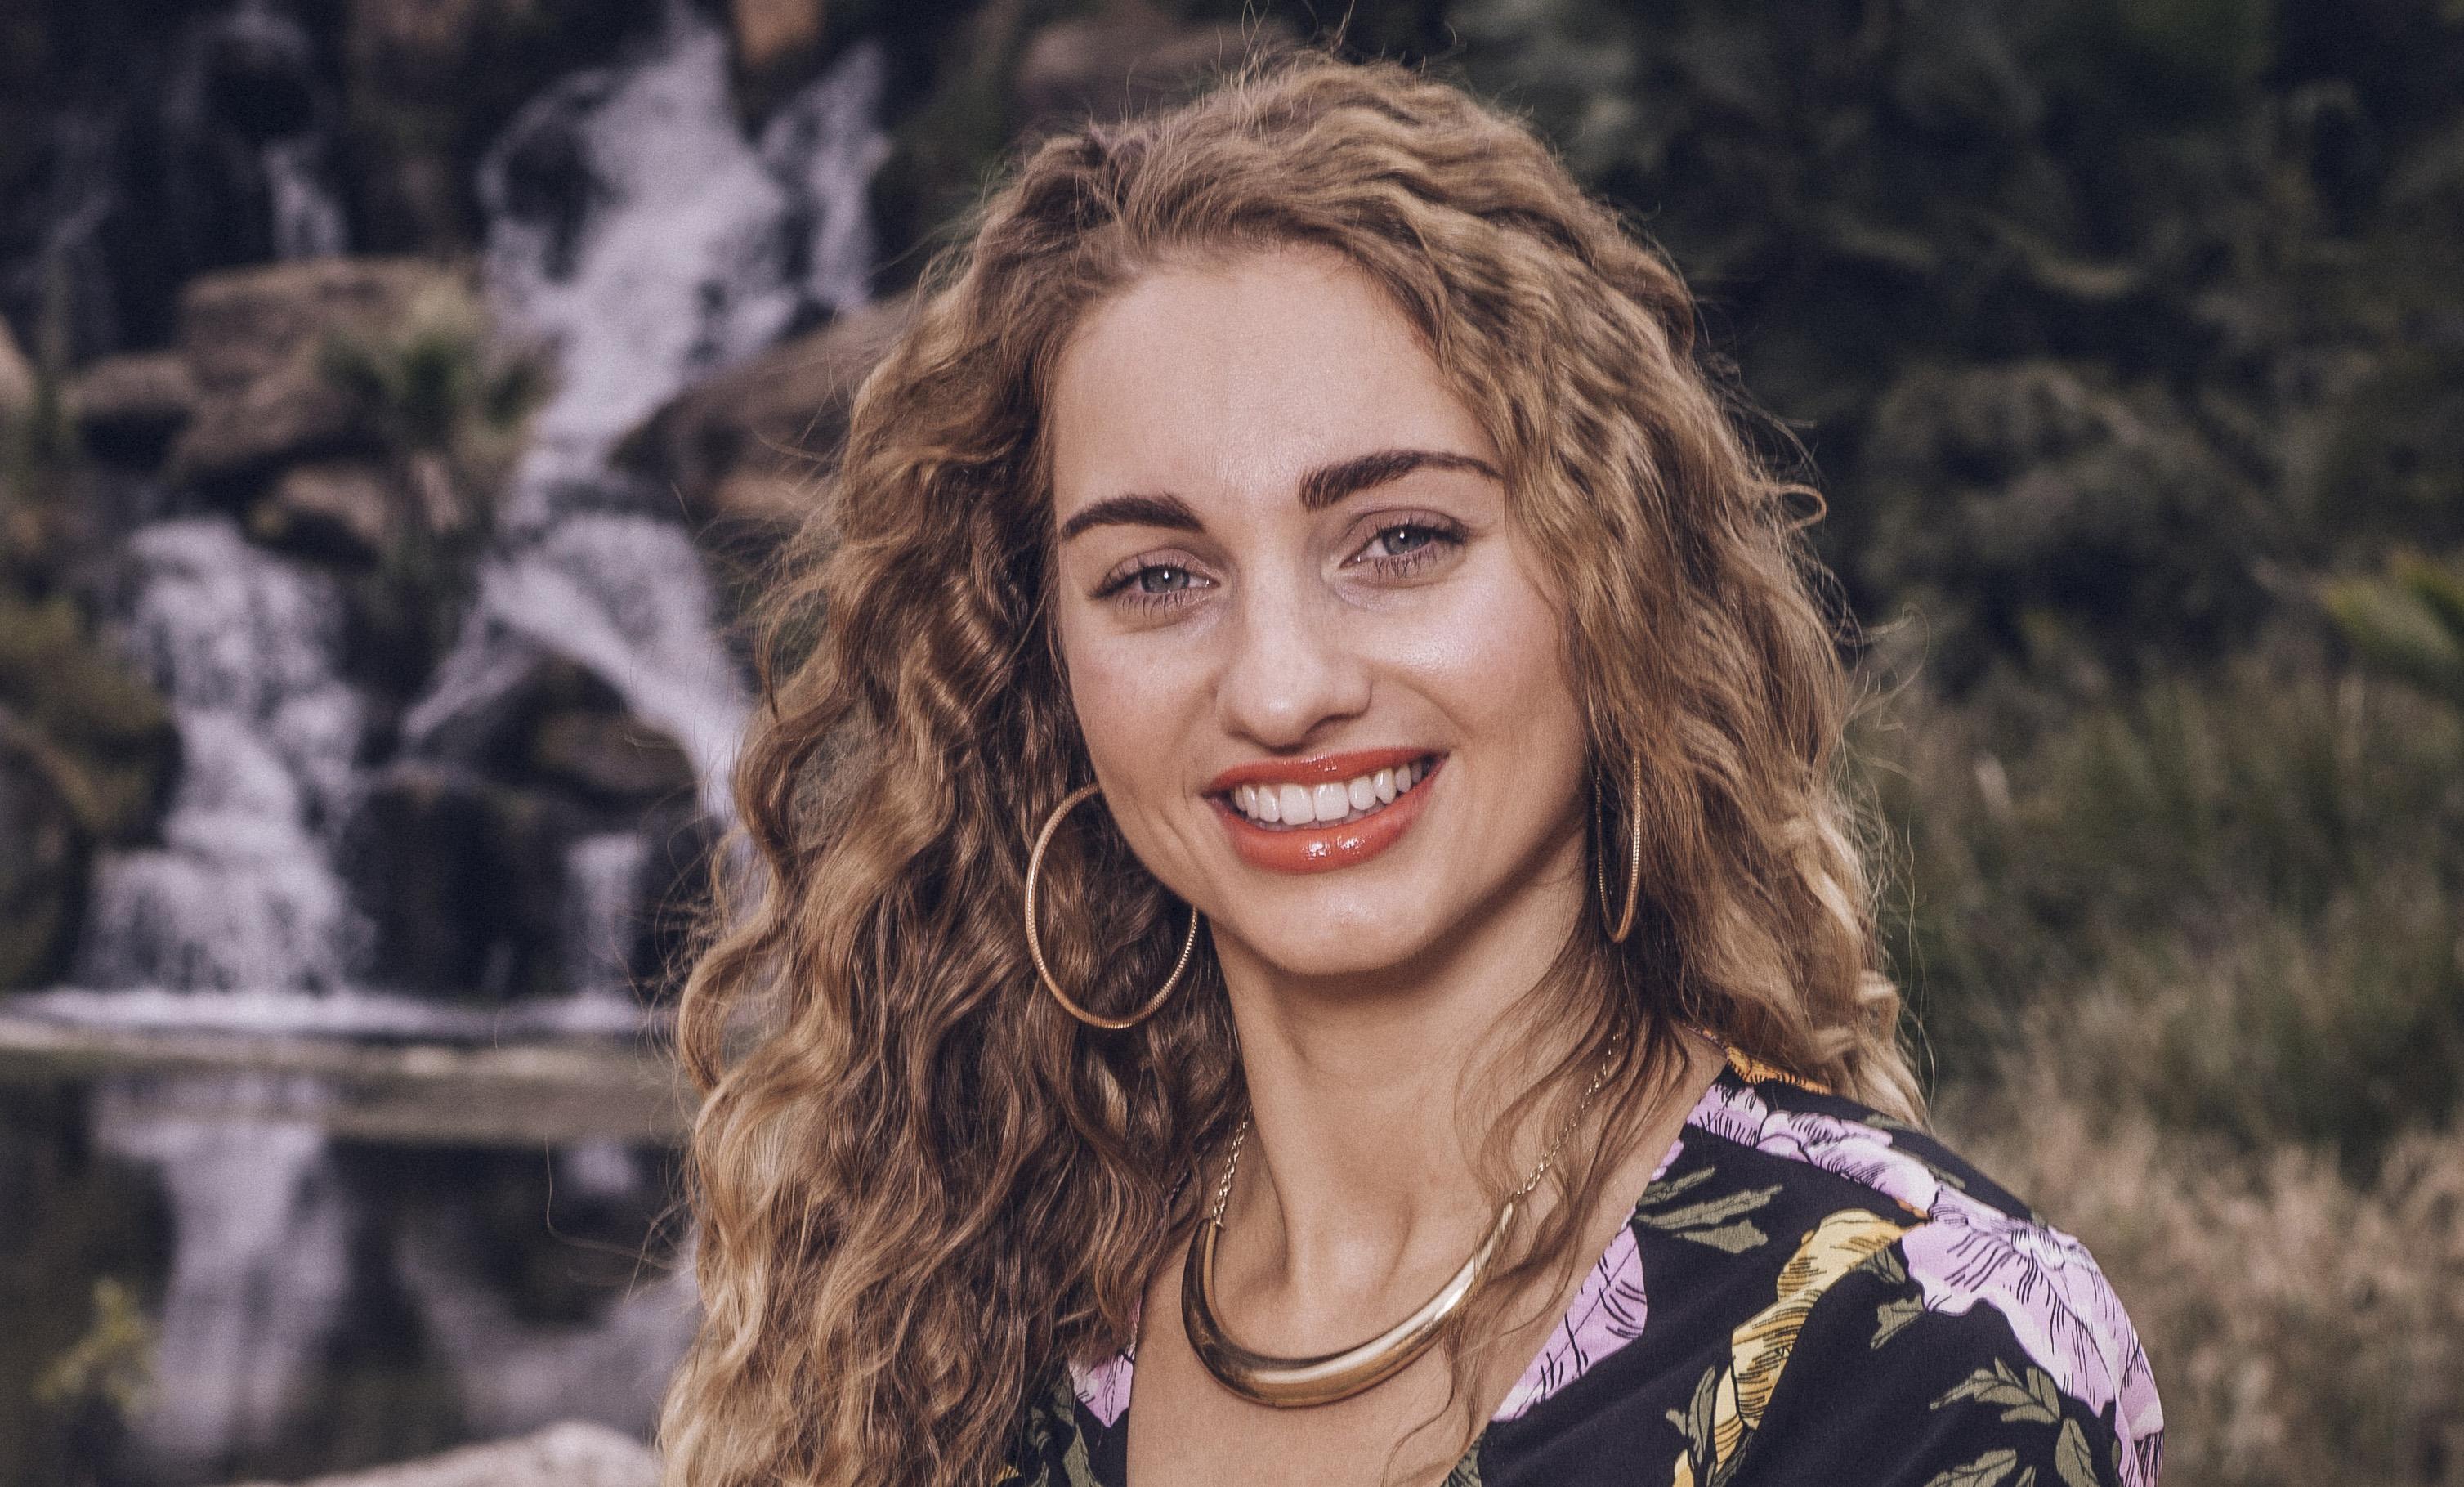 Talia Dean on The X Factor 2017